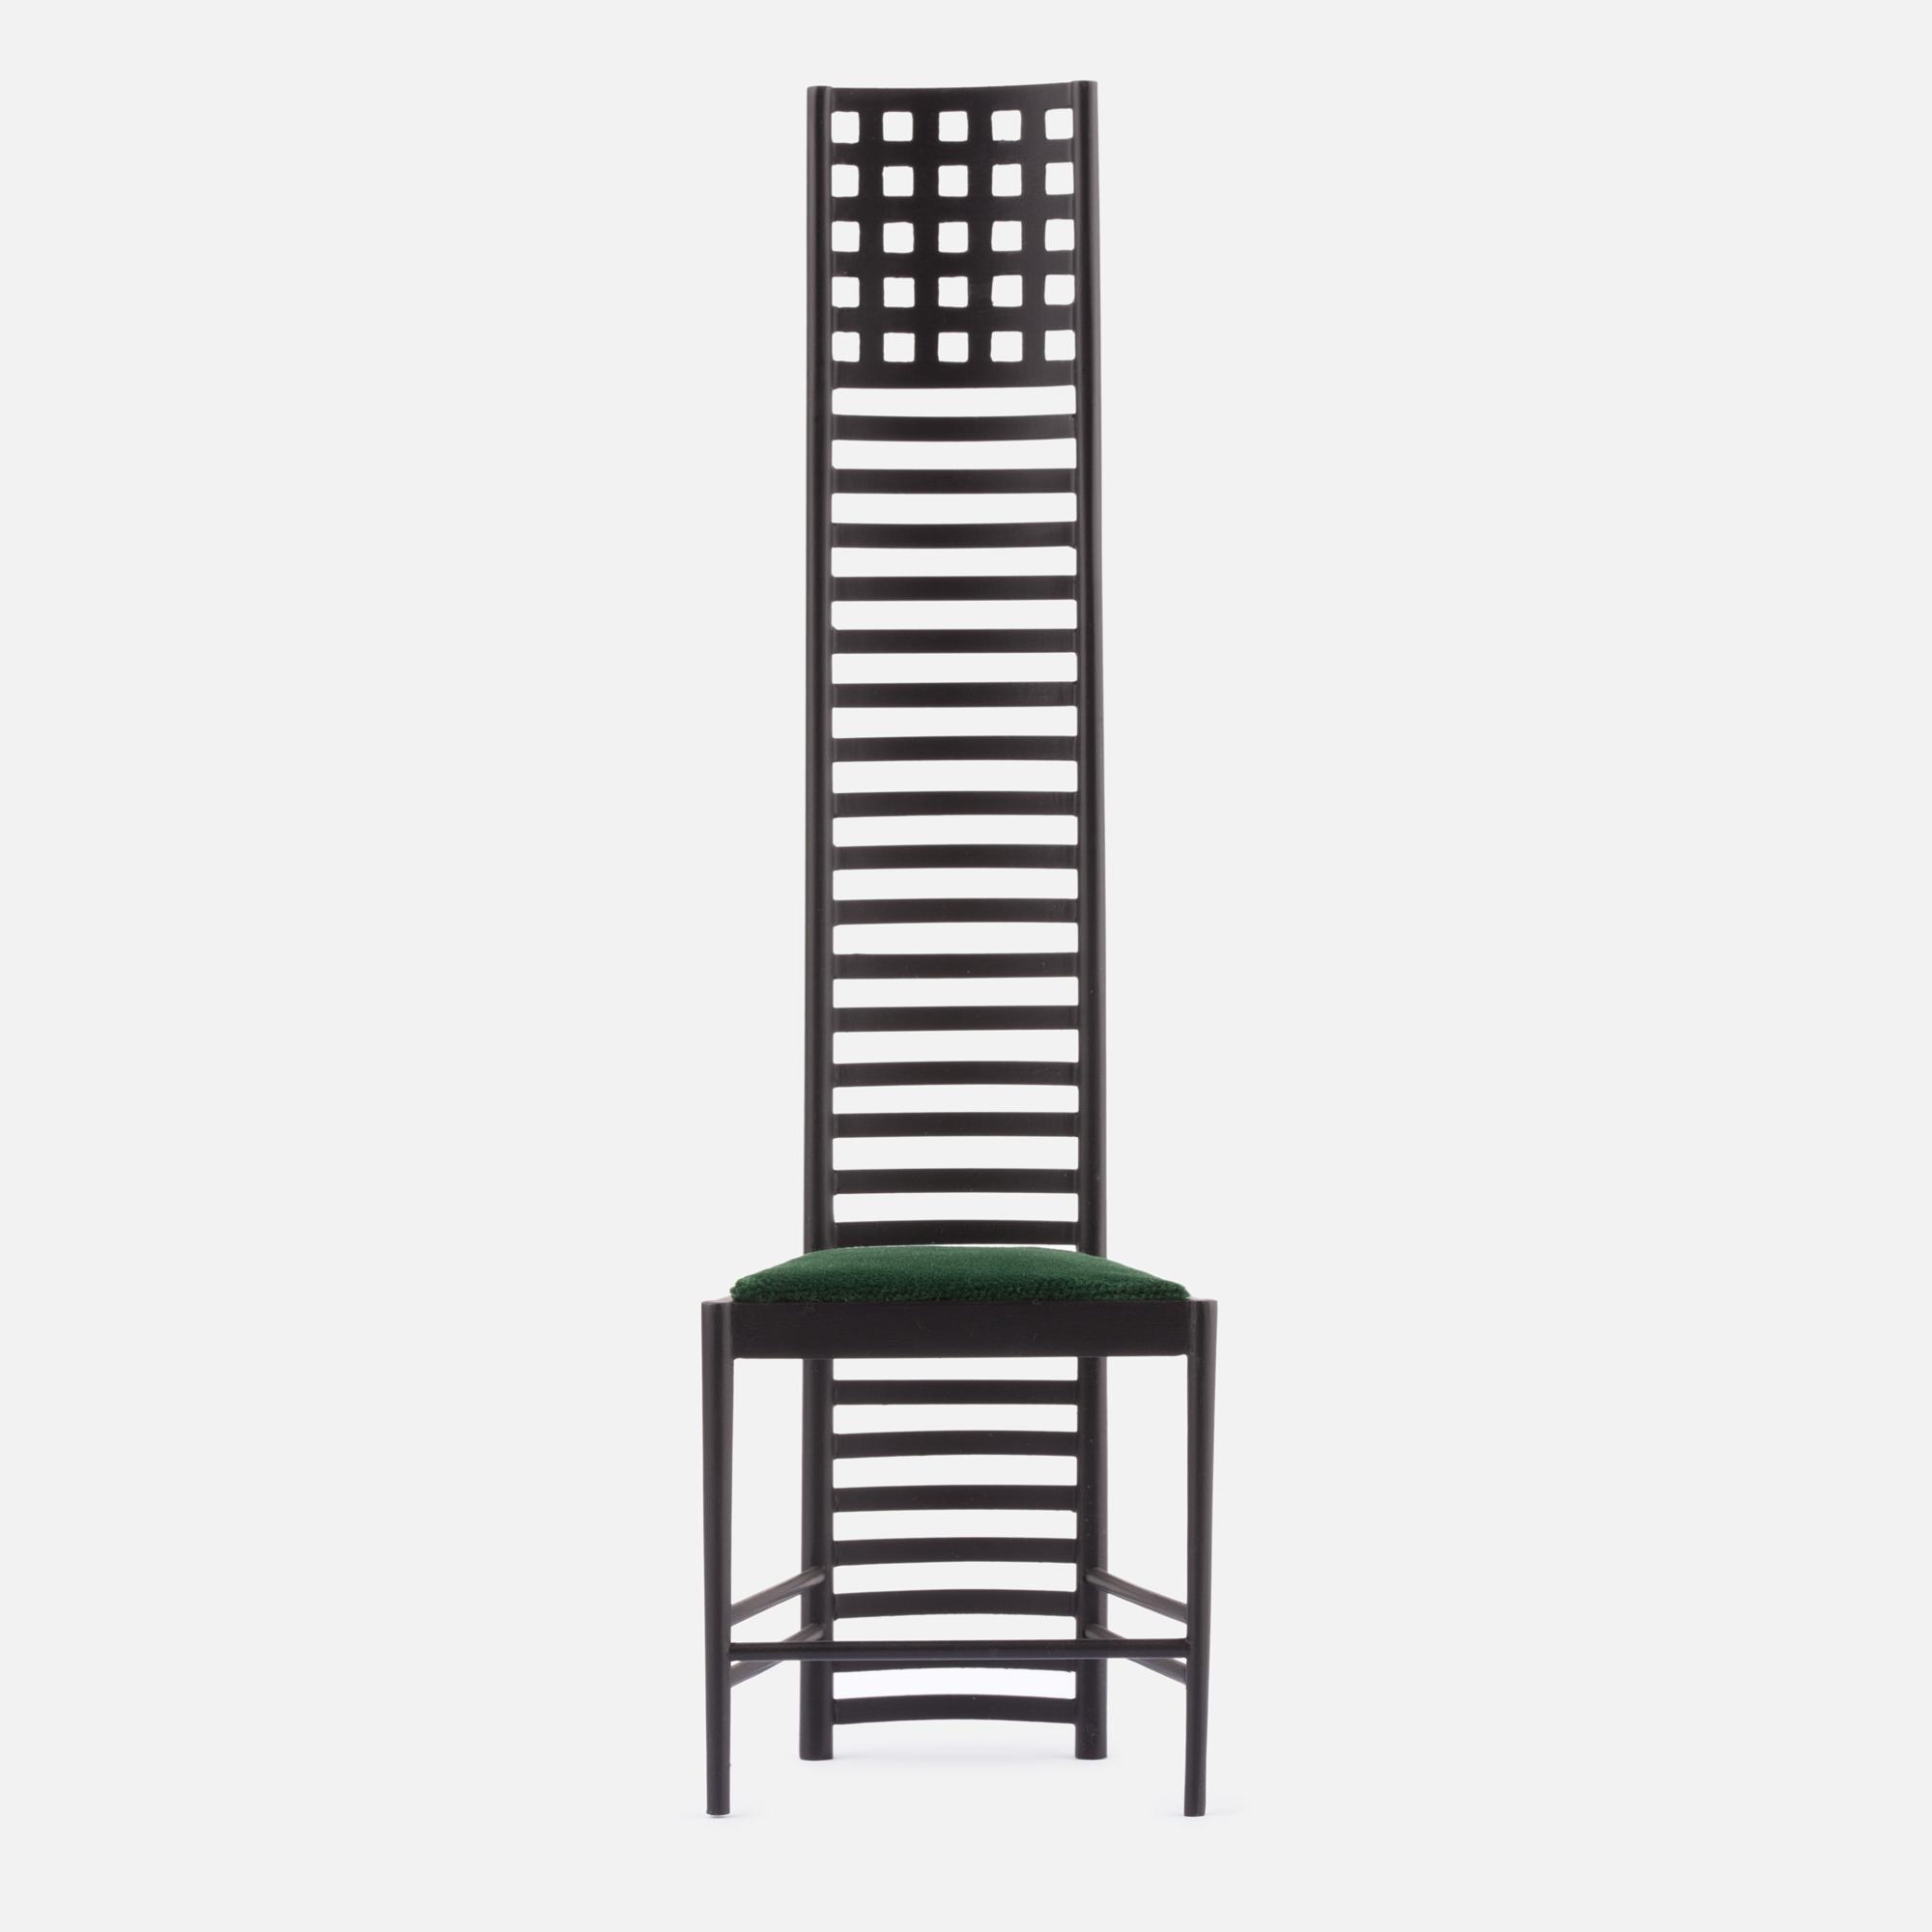 Miniature Hill House 1 chair, Mackintosh 1903